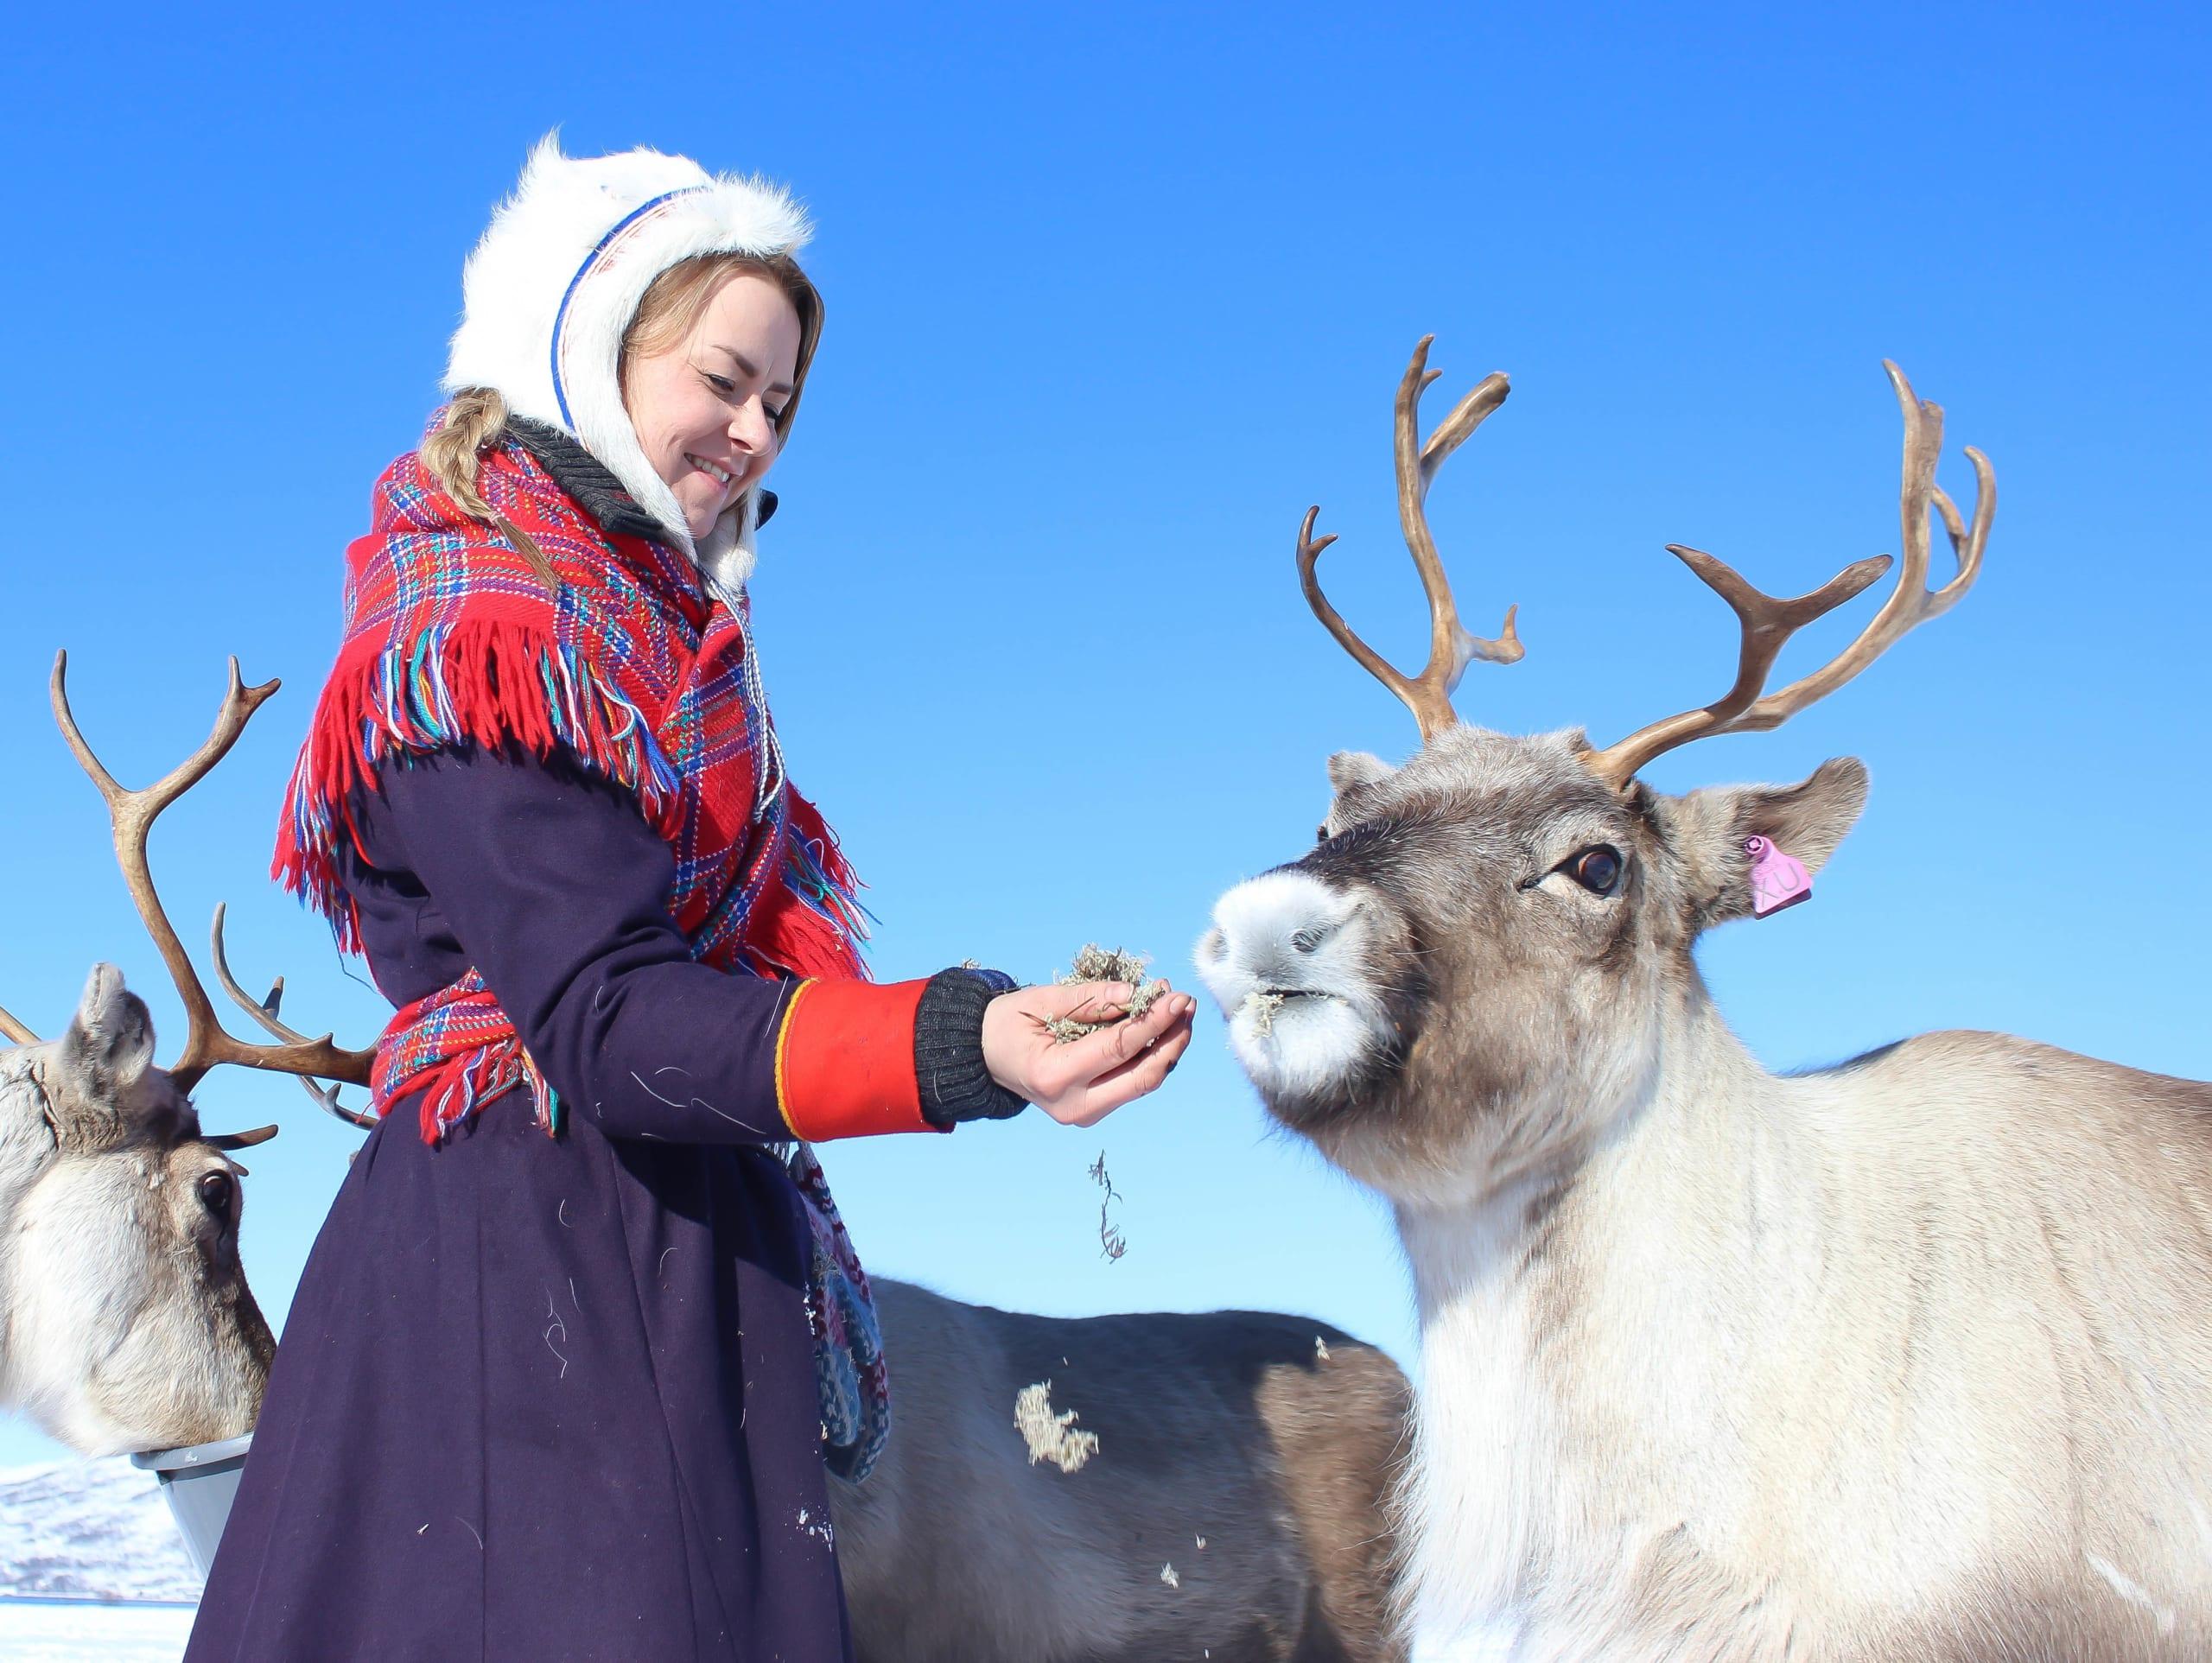 Sami woman feeding Arctic Reindeer